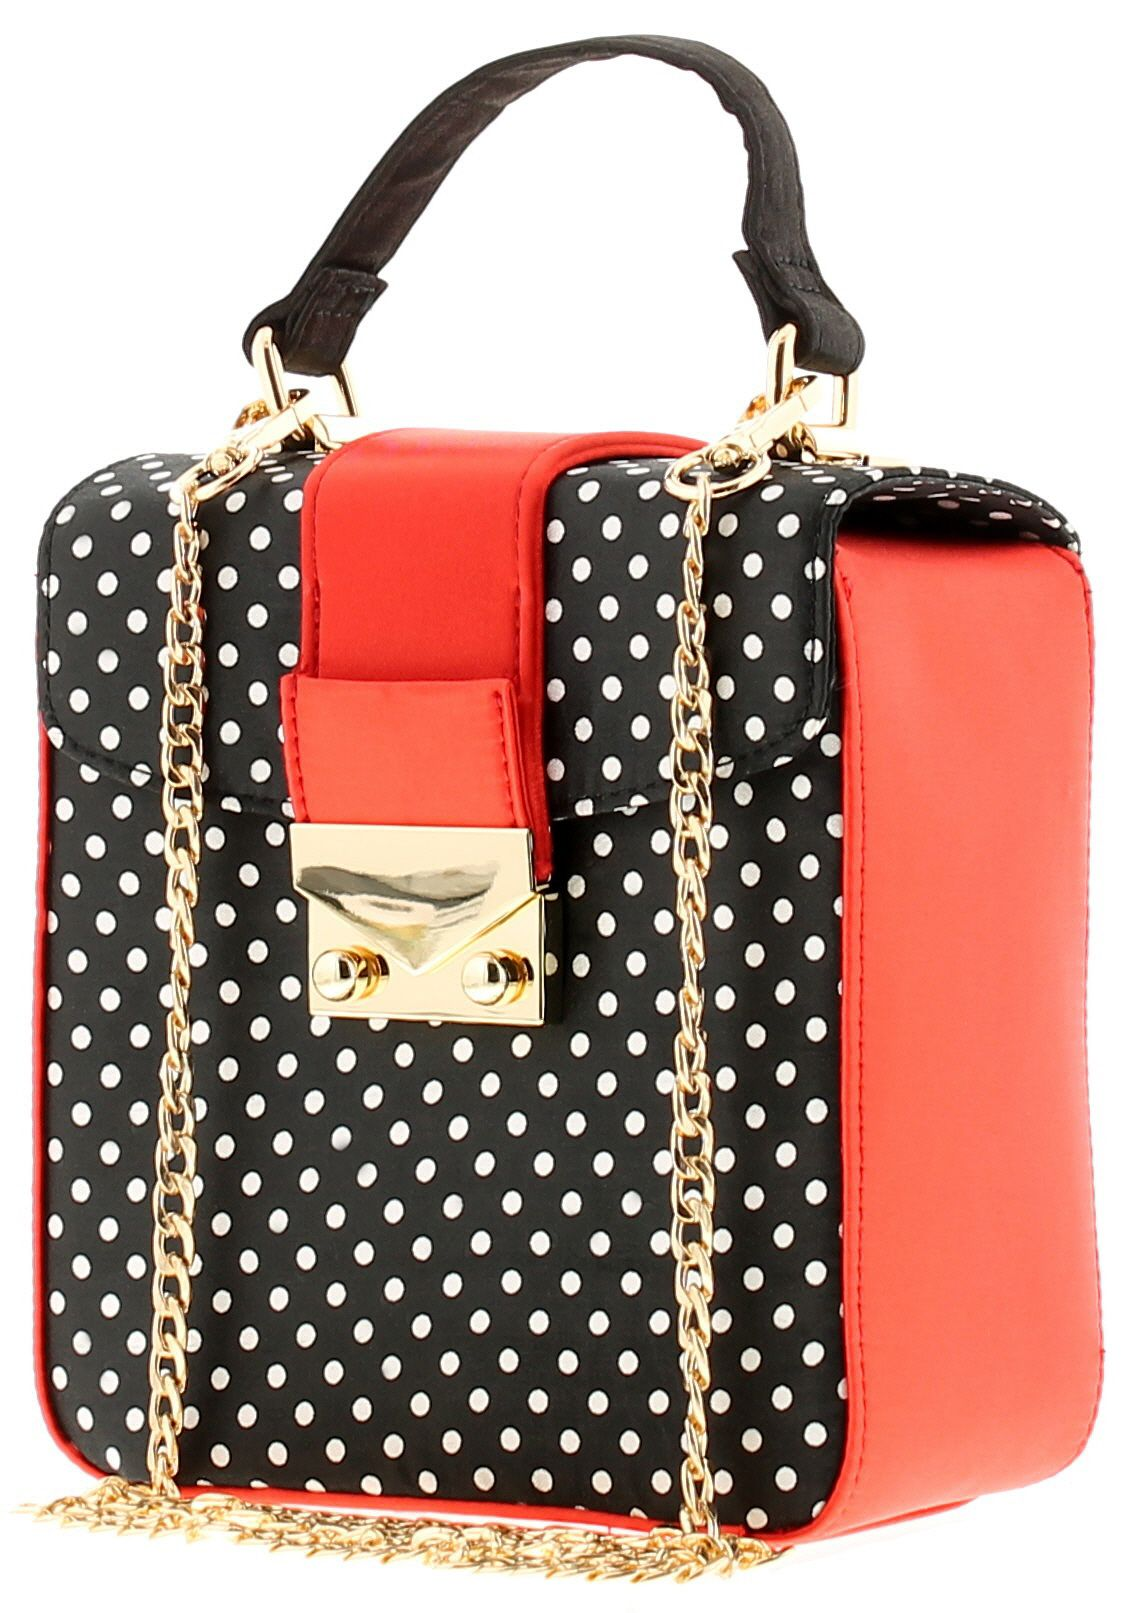 Joe Browns Couture scrumptious womens bag